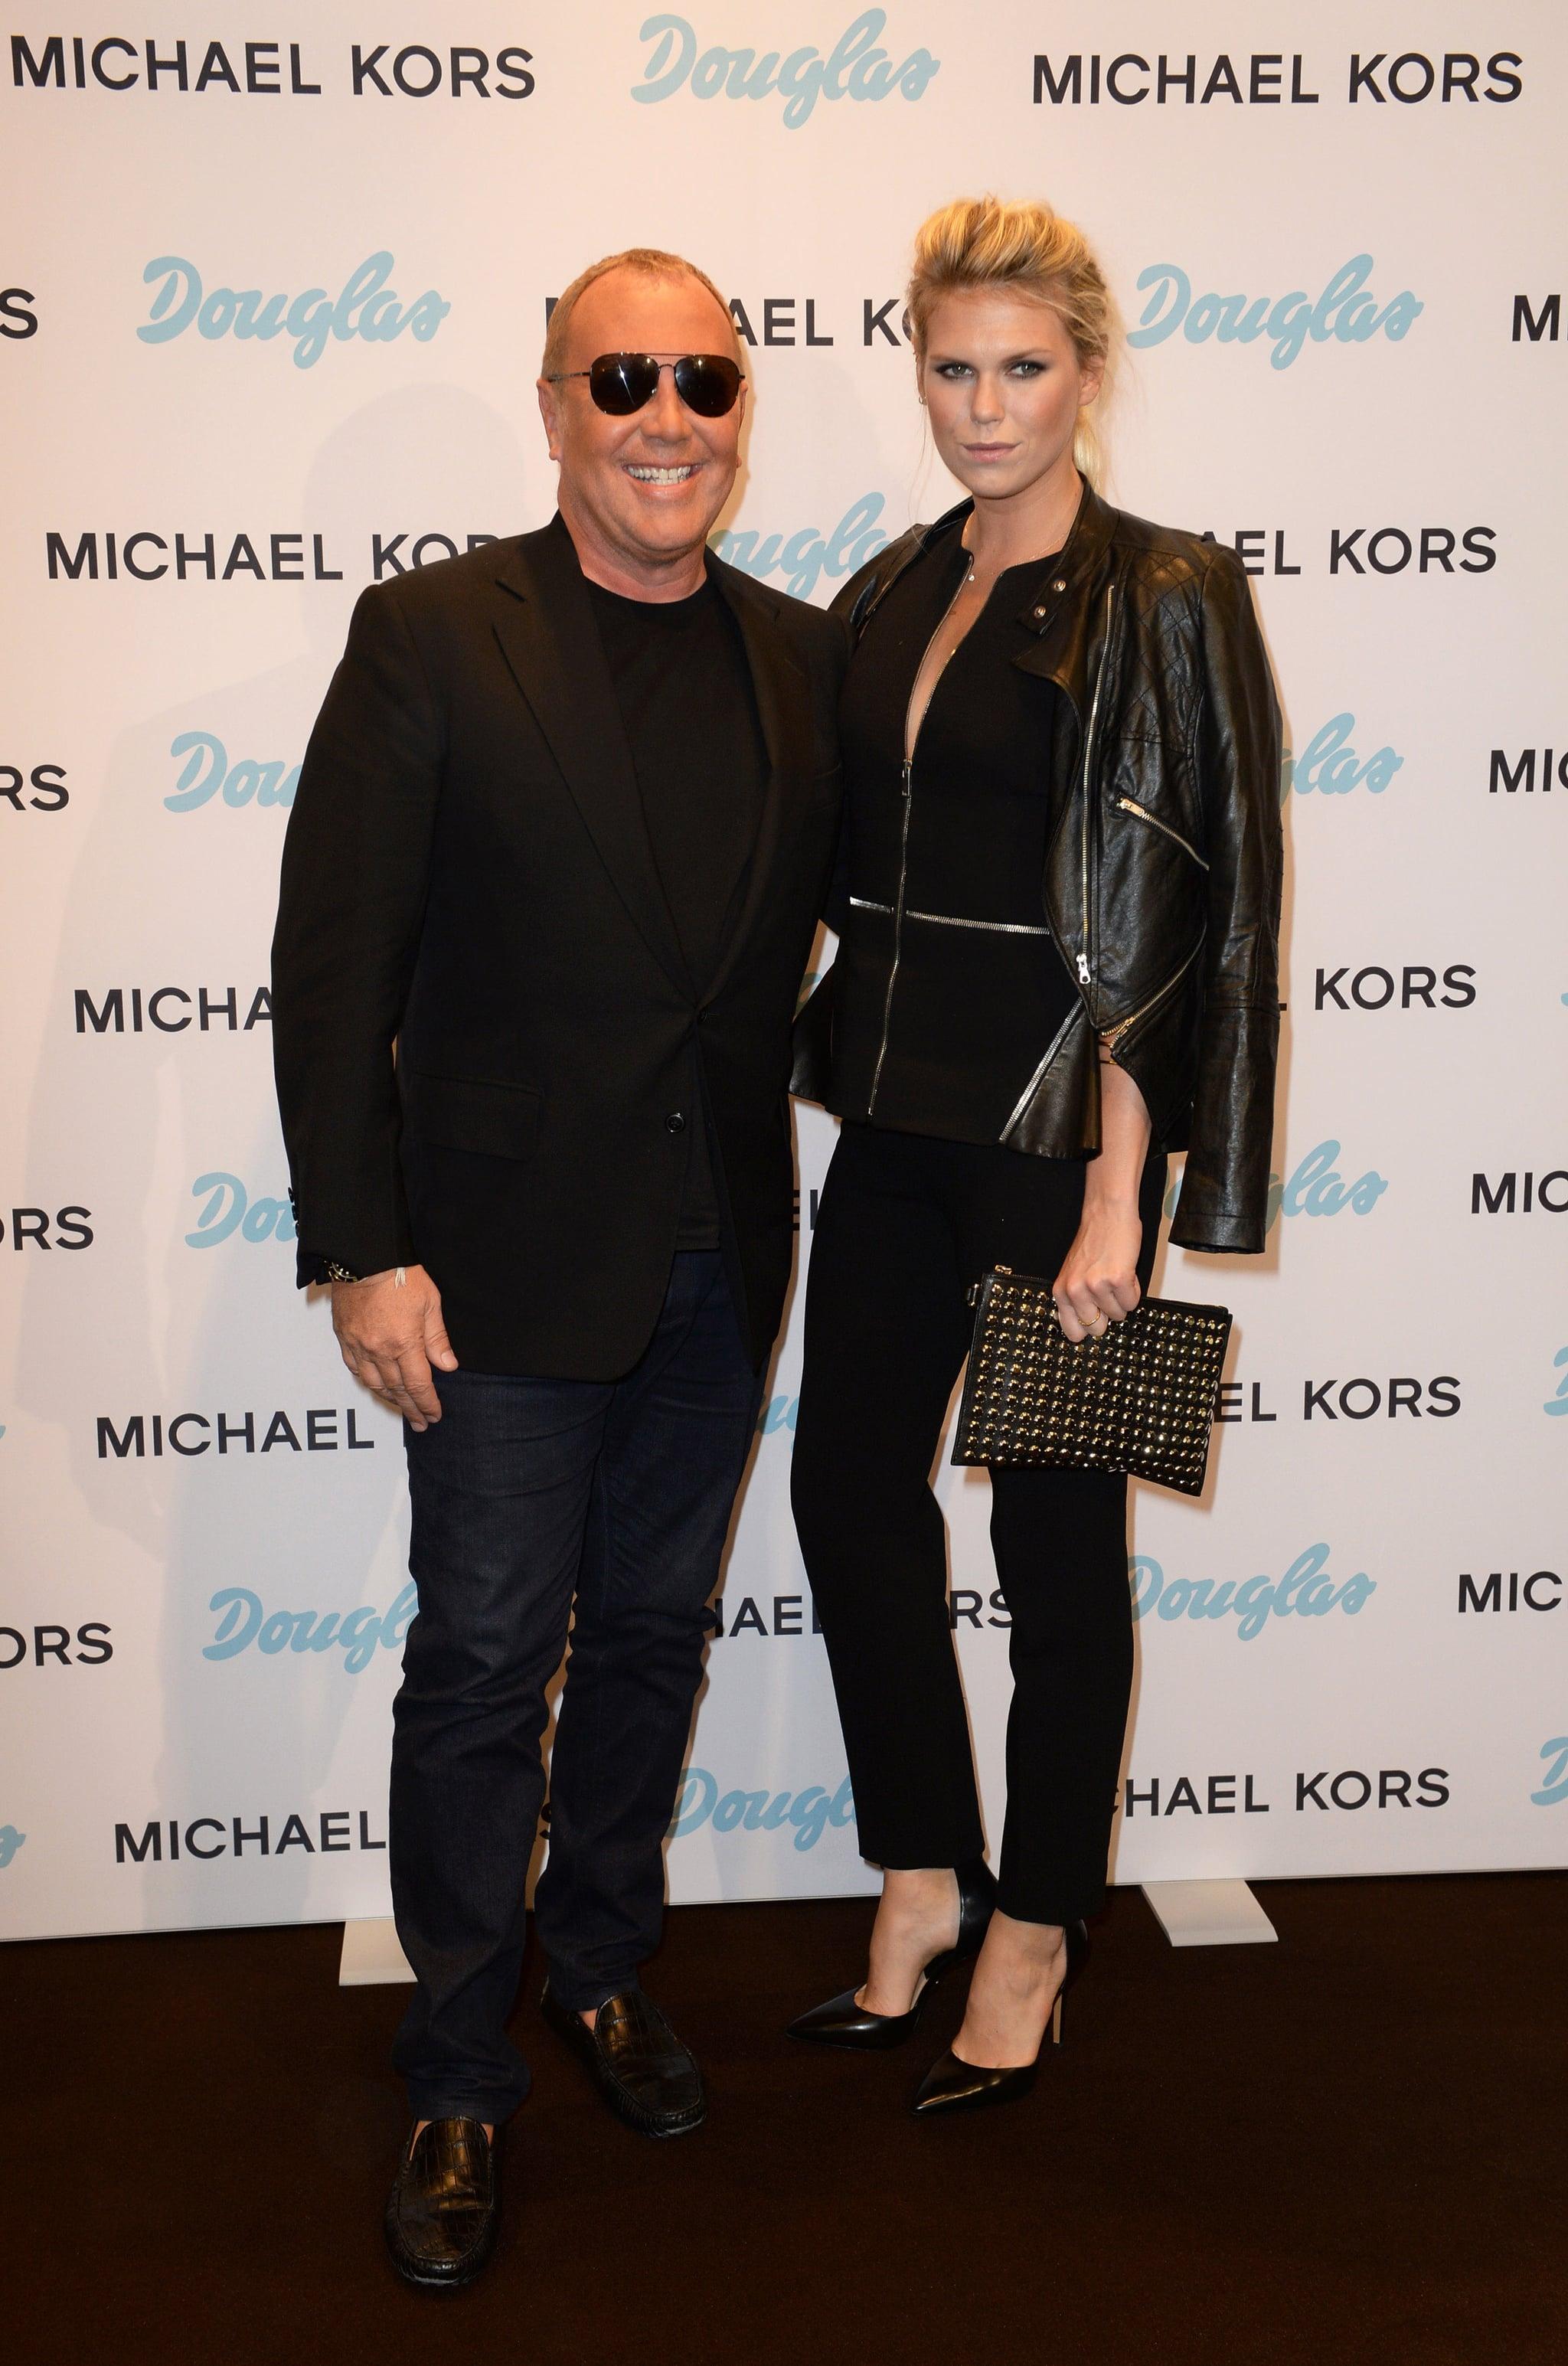 Alexandra Richards joined Michael Kors at the designer's beauty launch at Douglas.